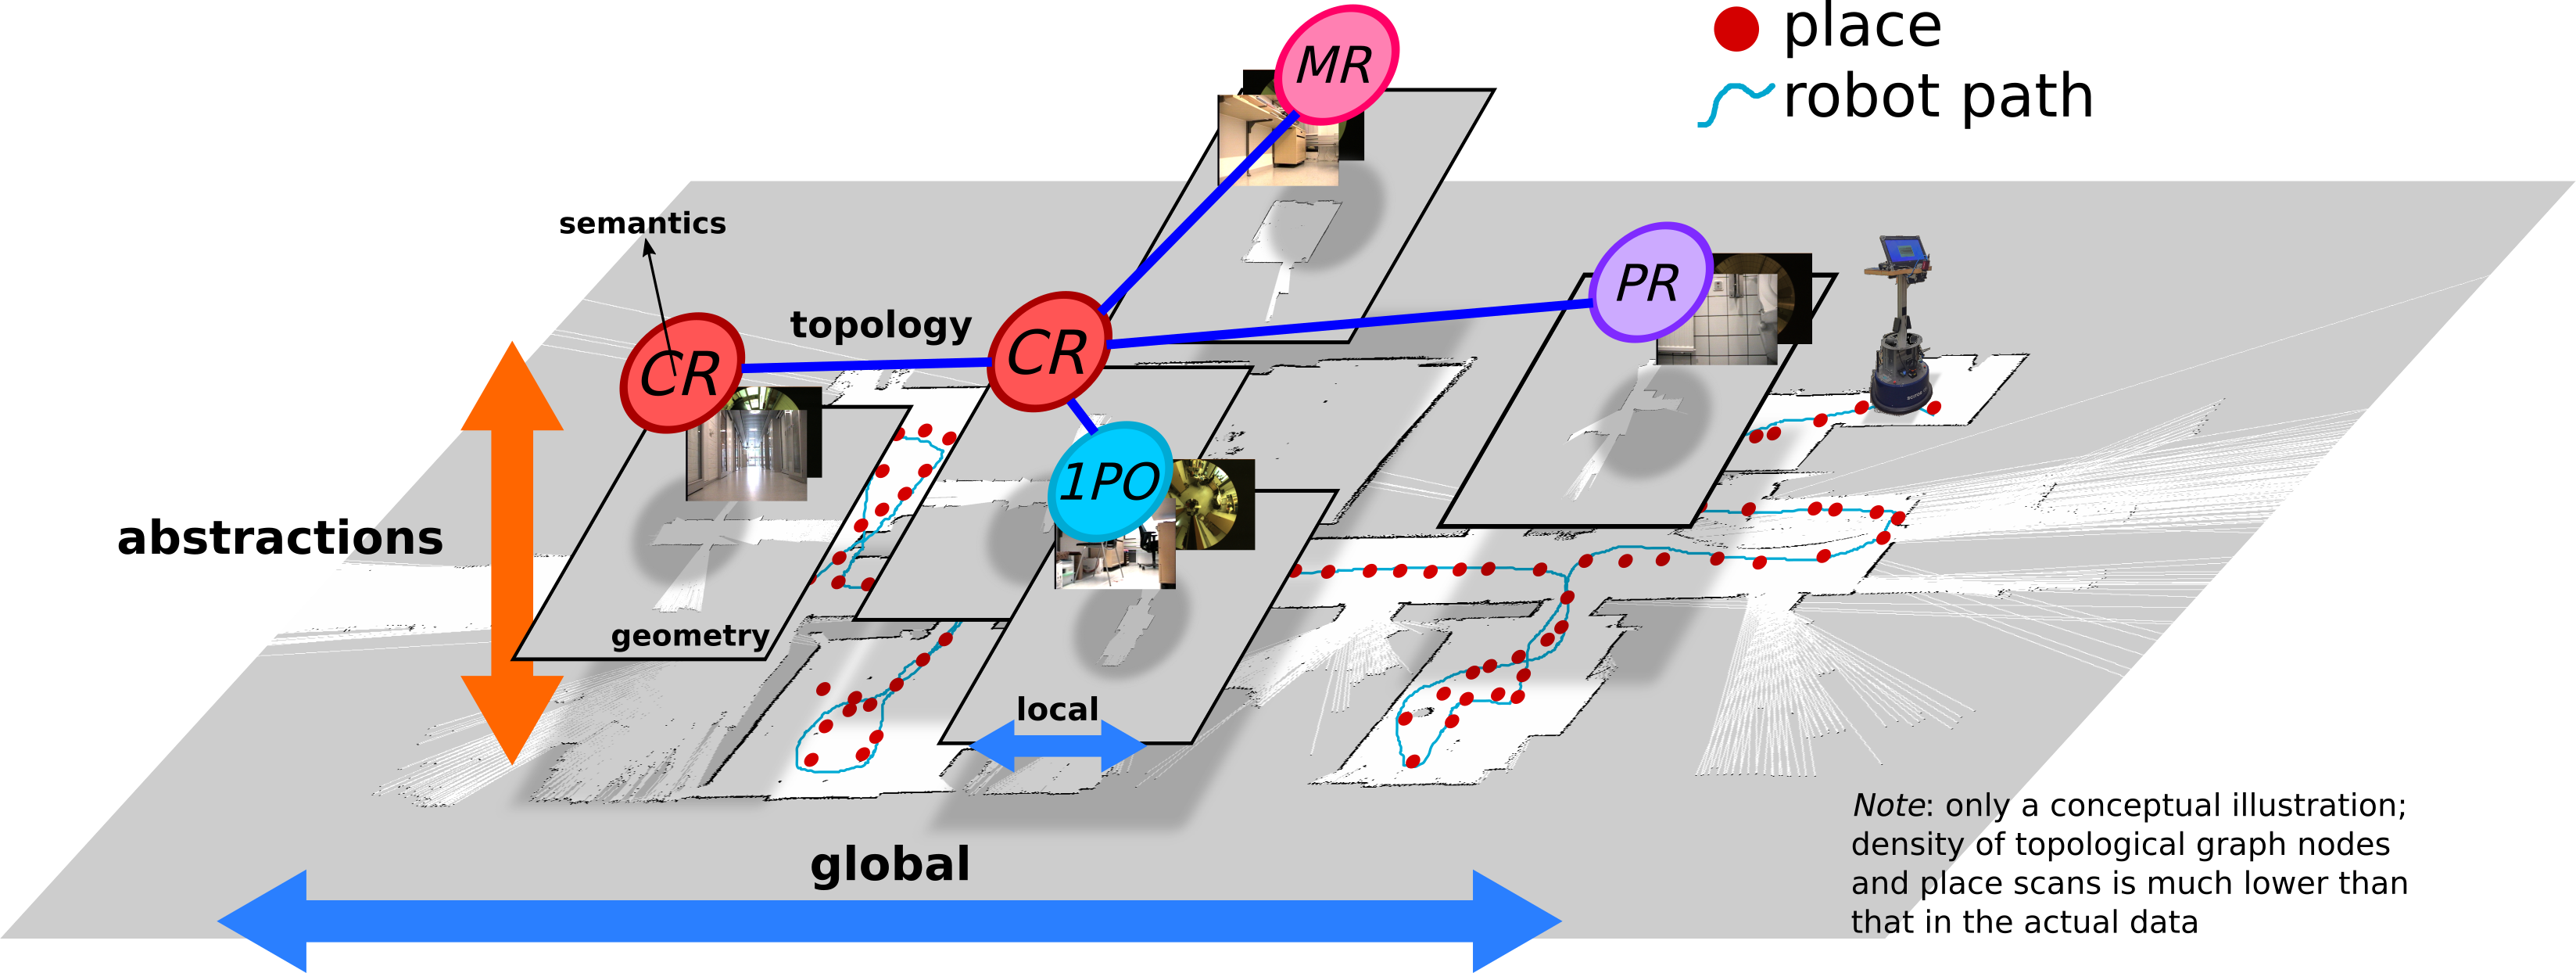 COLD - Cognitive rObot Localization Database